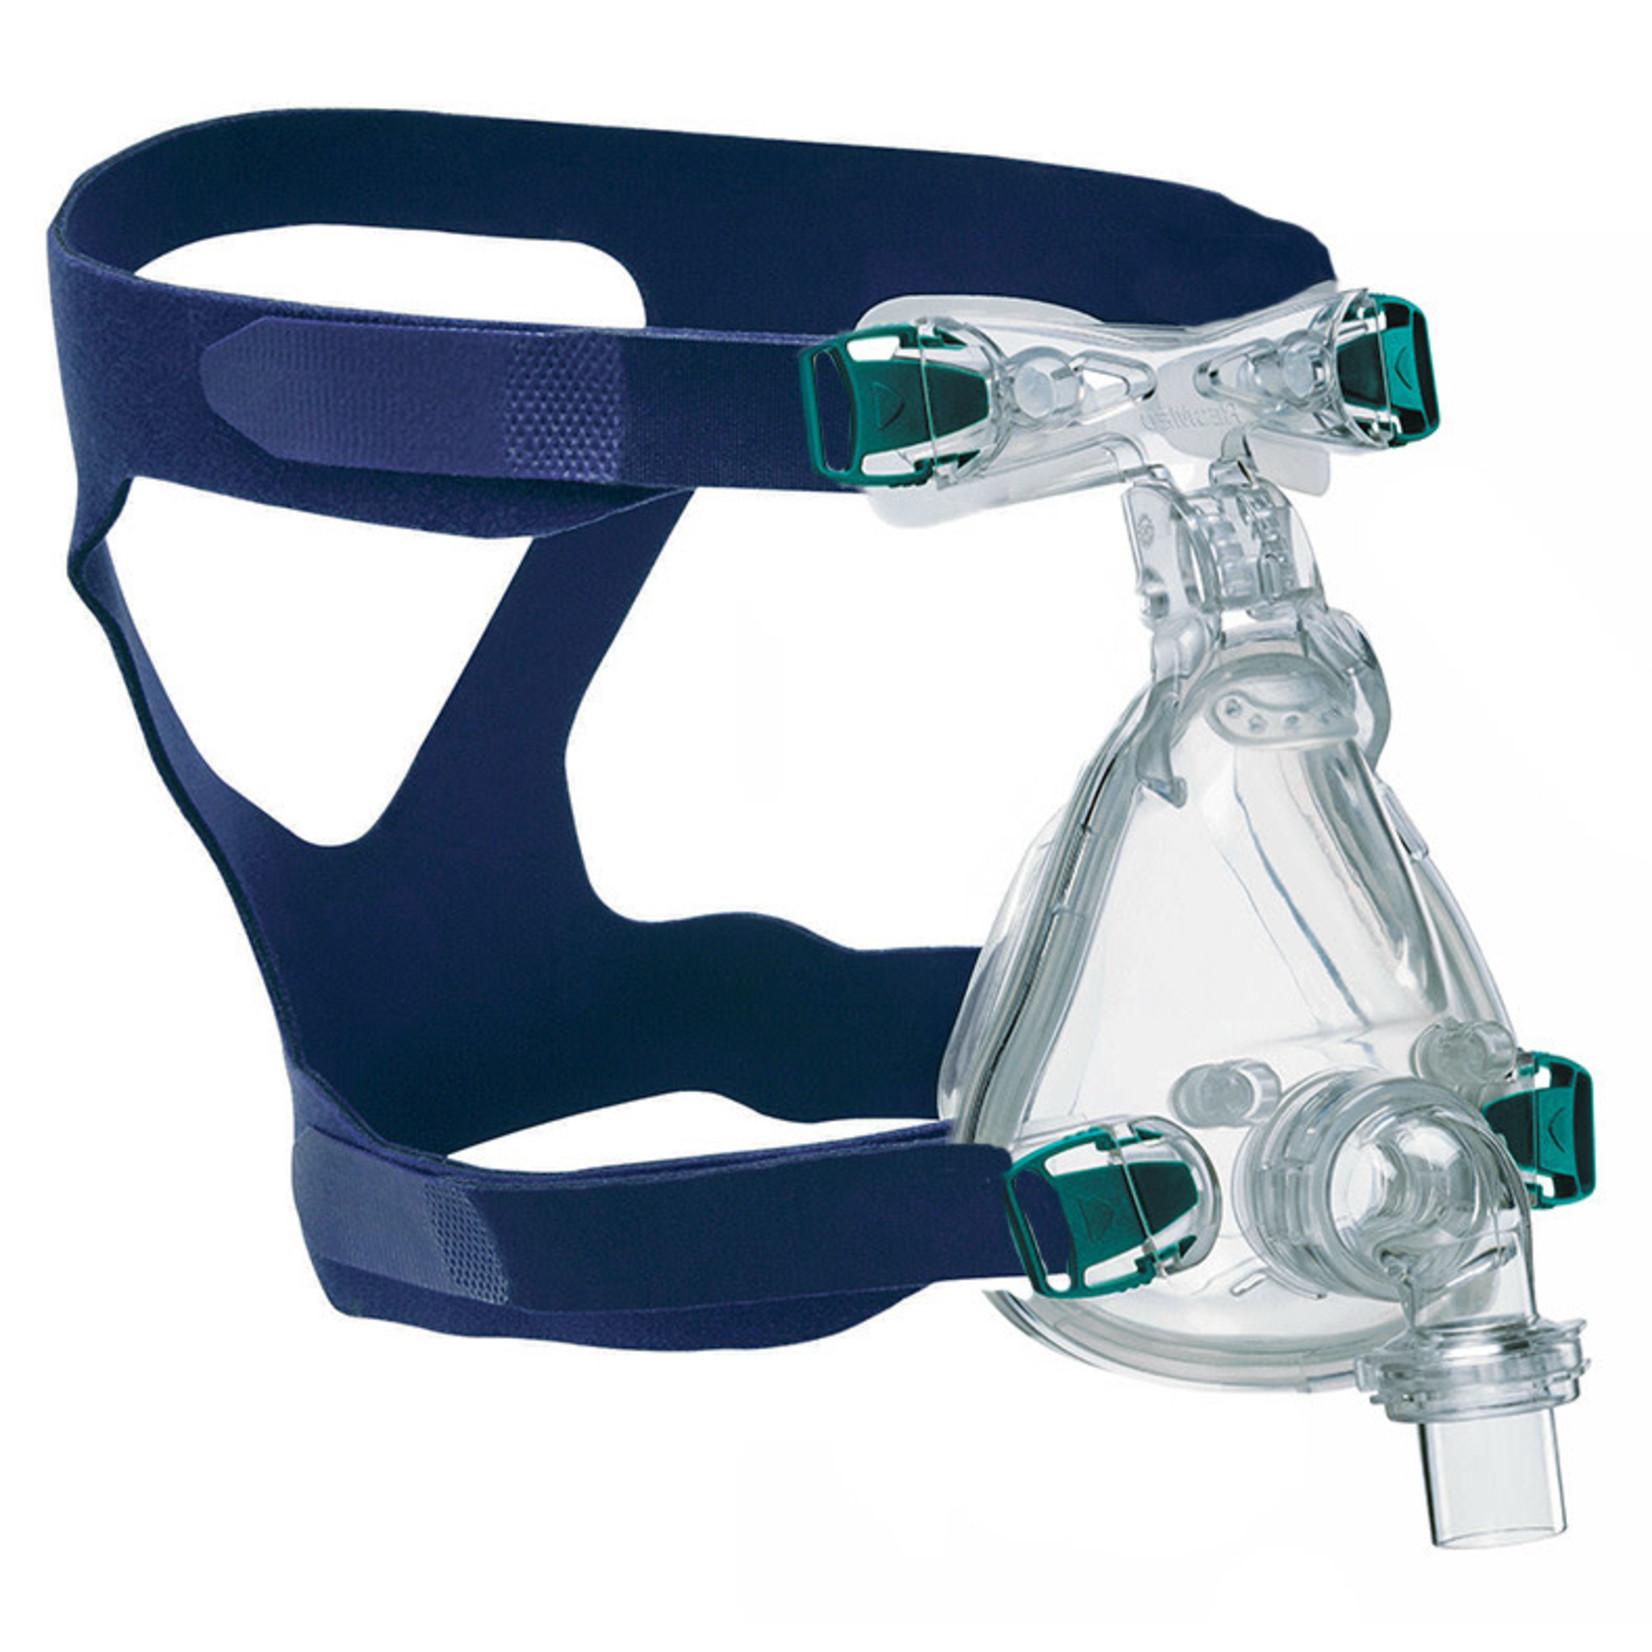 Ultra Mirage Full Face CPAP Mask w/Headgear